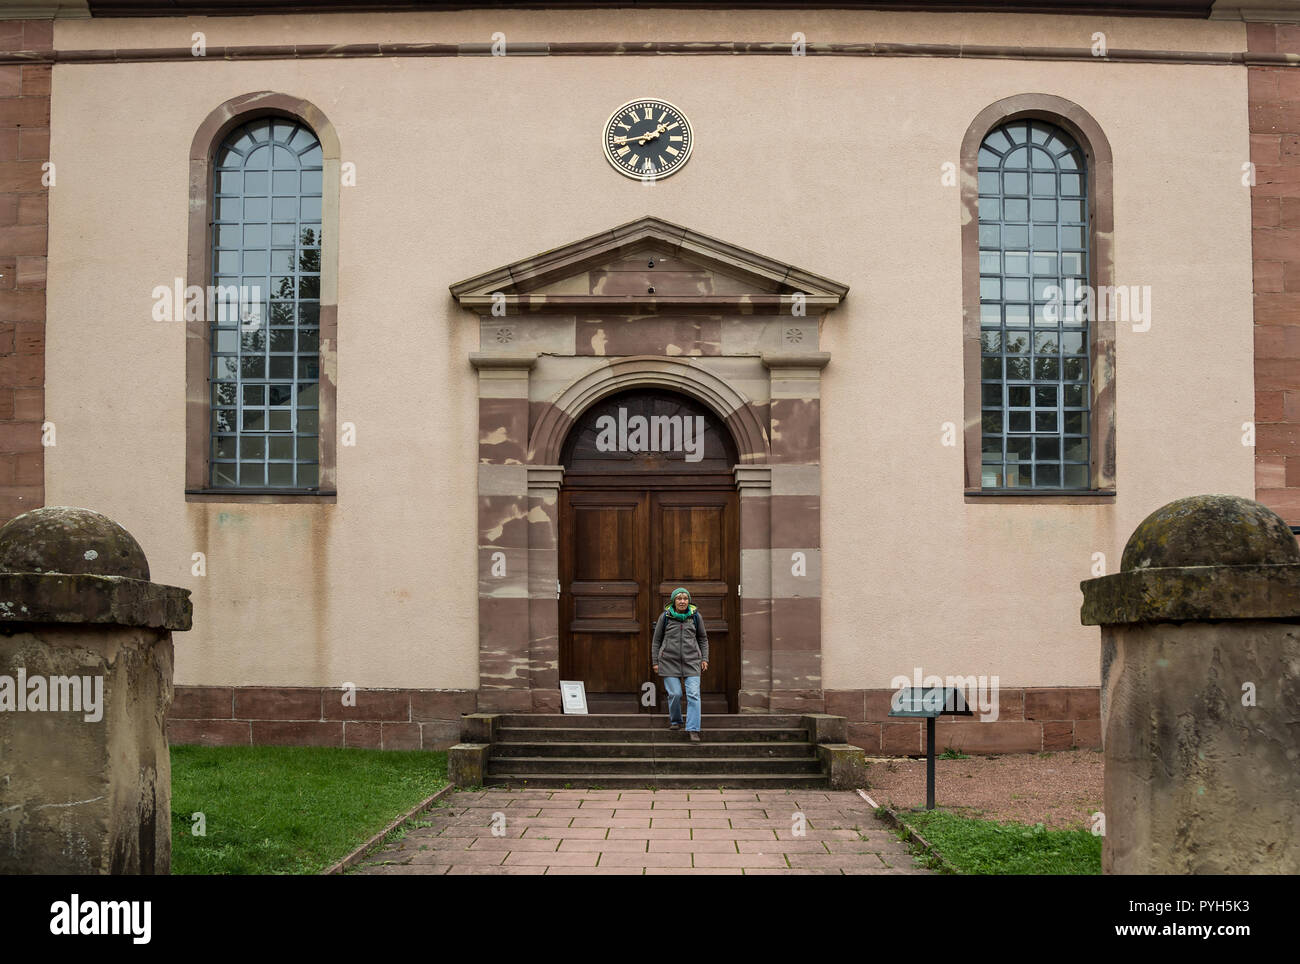 France - The Jewish Alsatian Museum in Bouxwiller - Stock Image